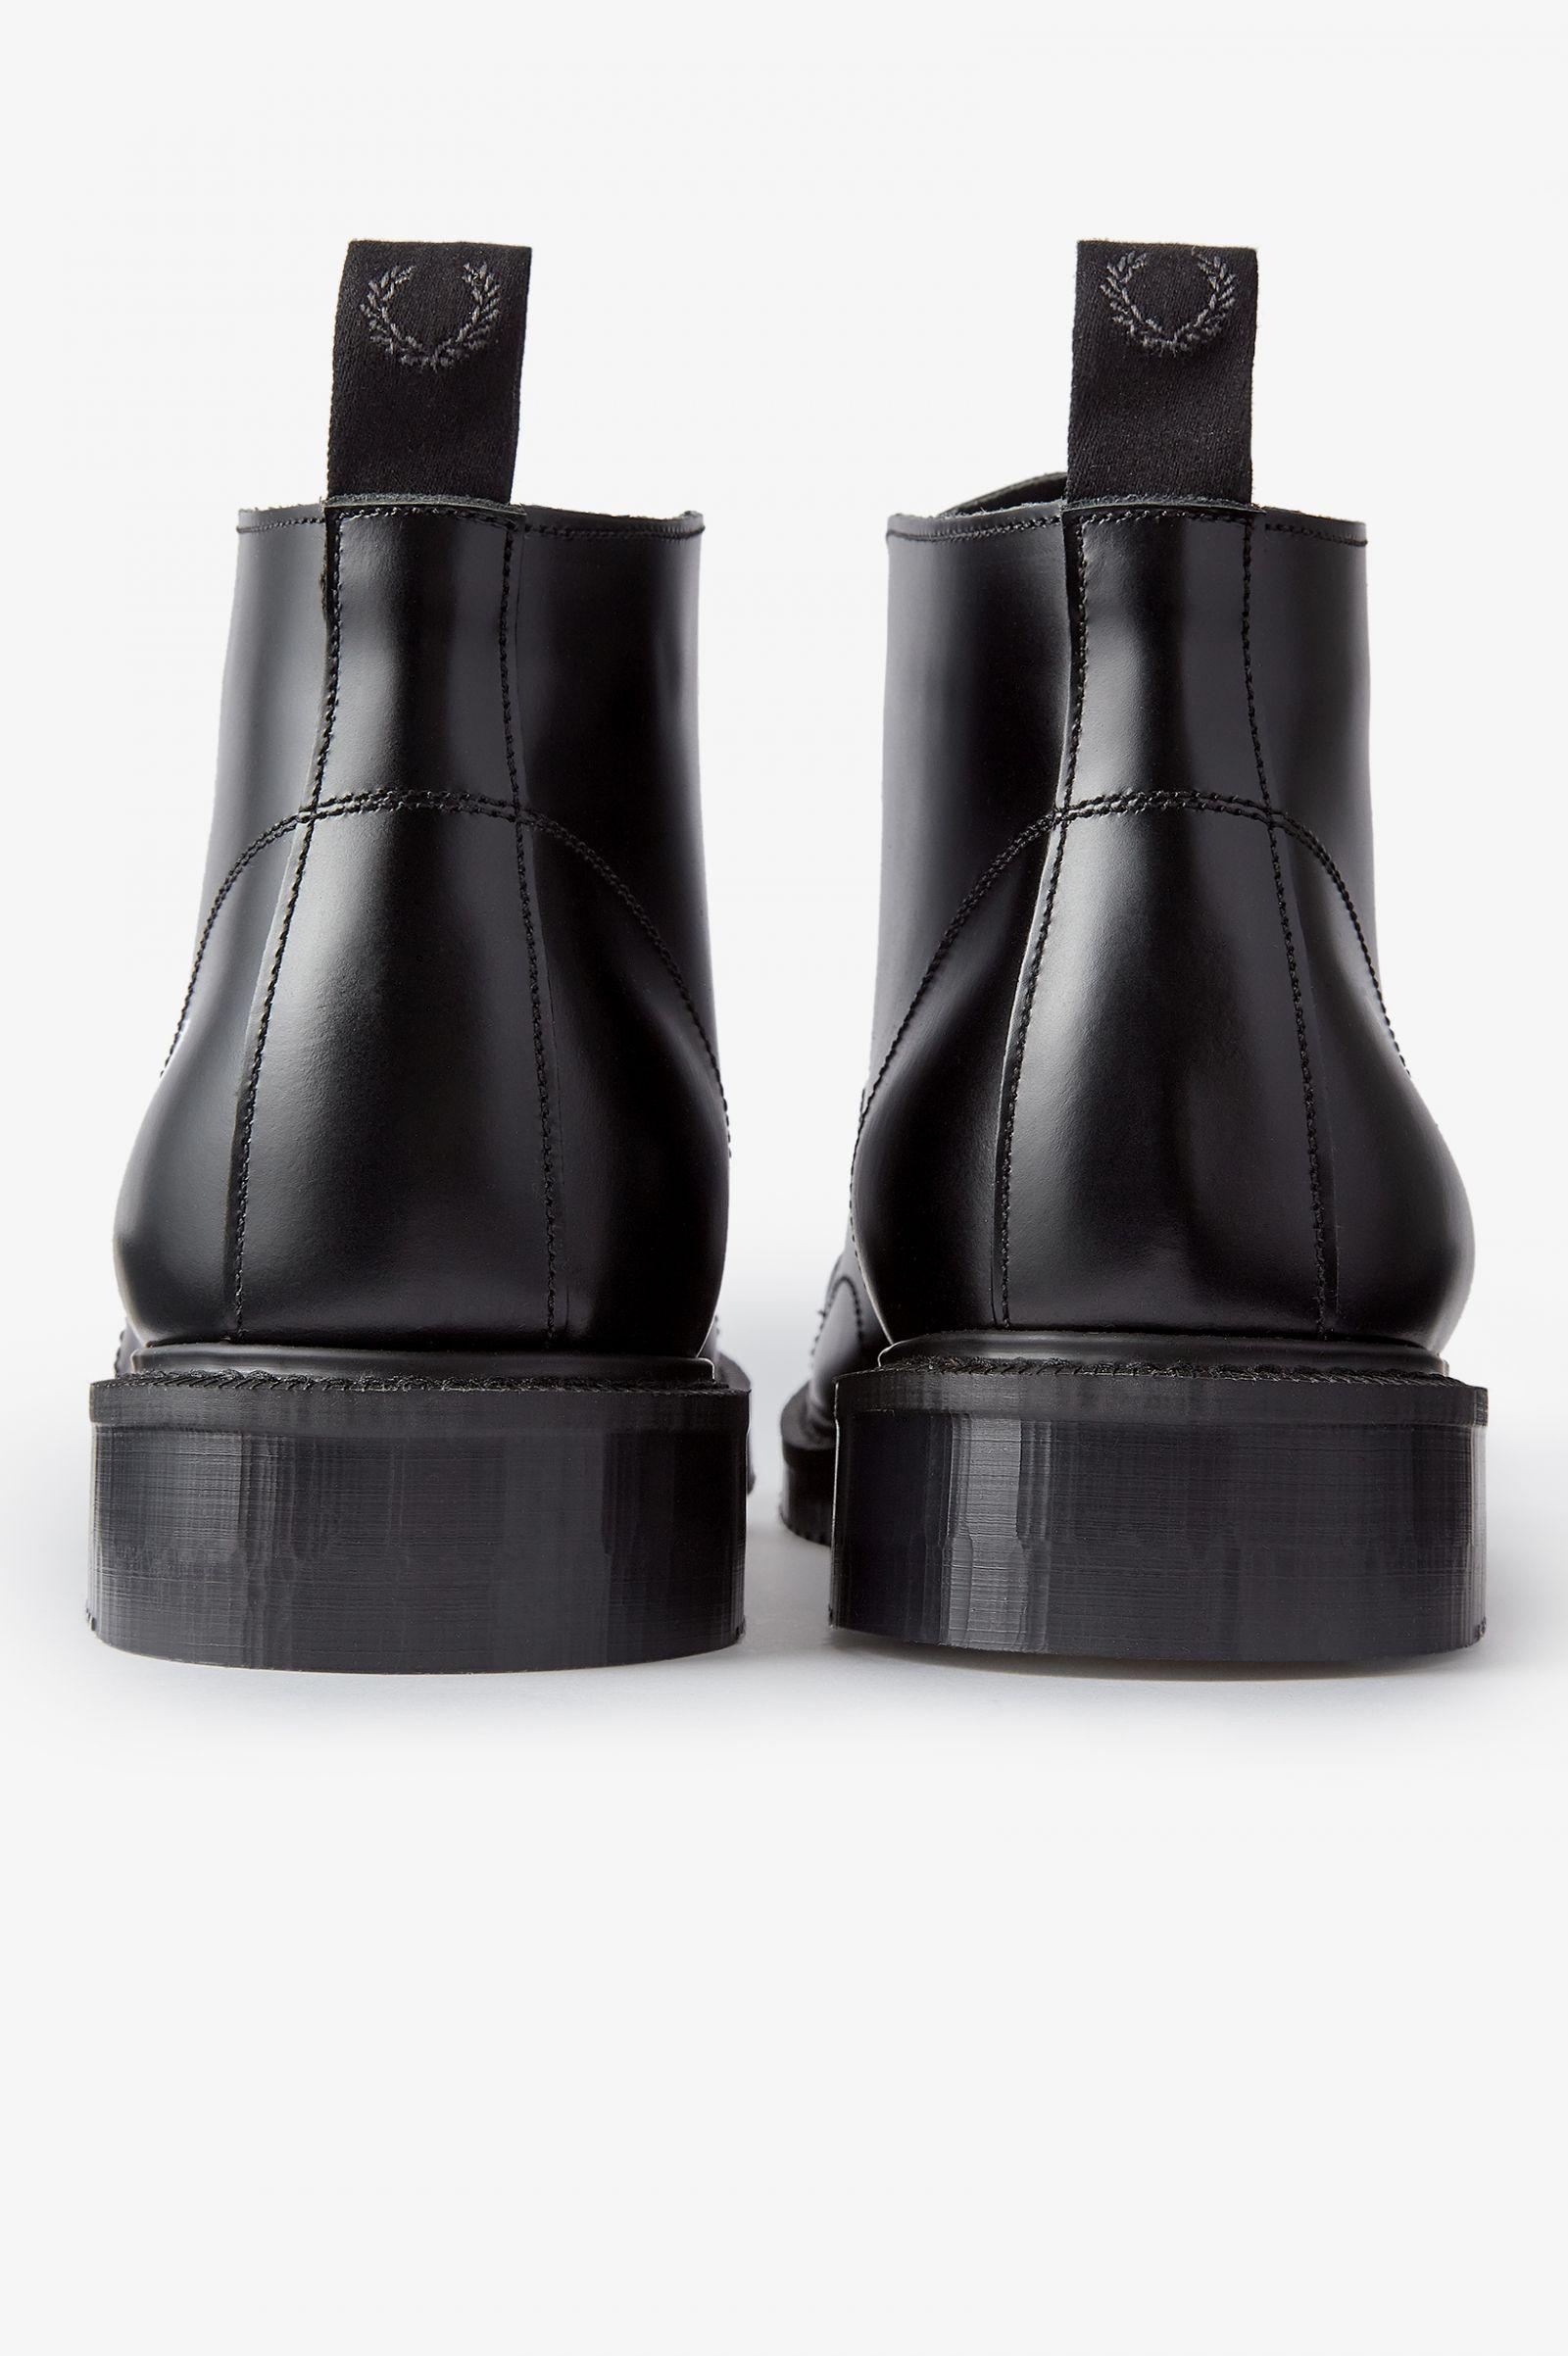 George Cox Leather Monkey Boot - Black